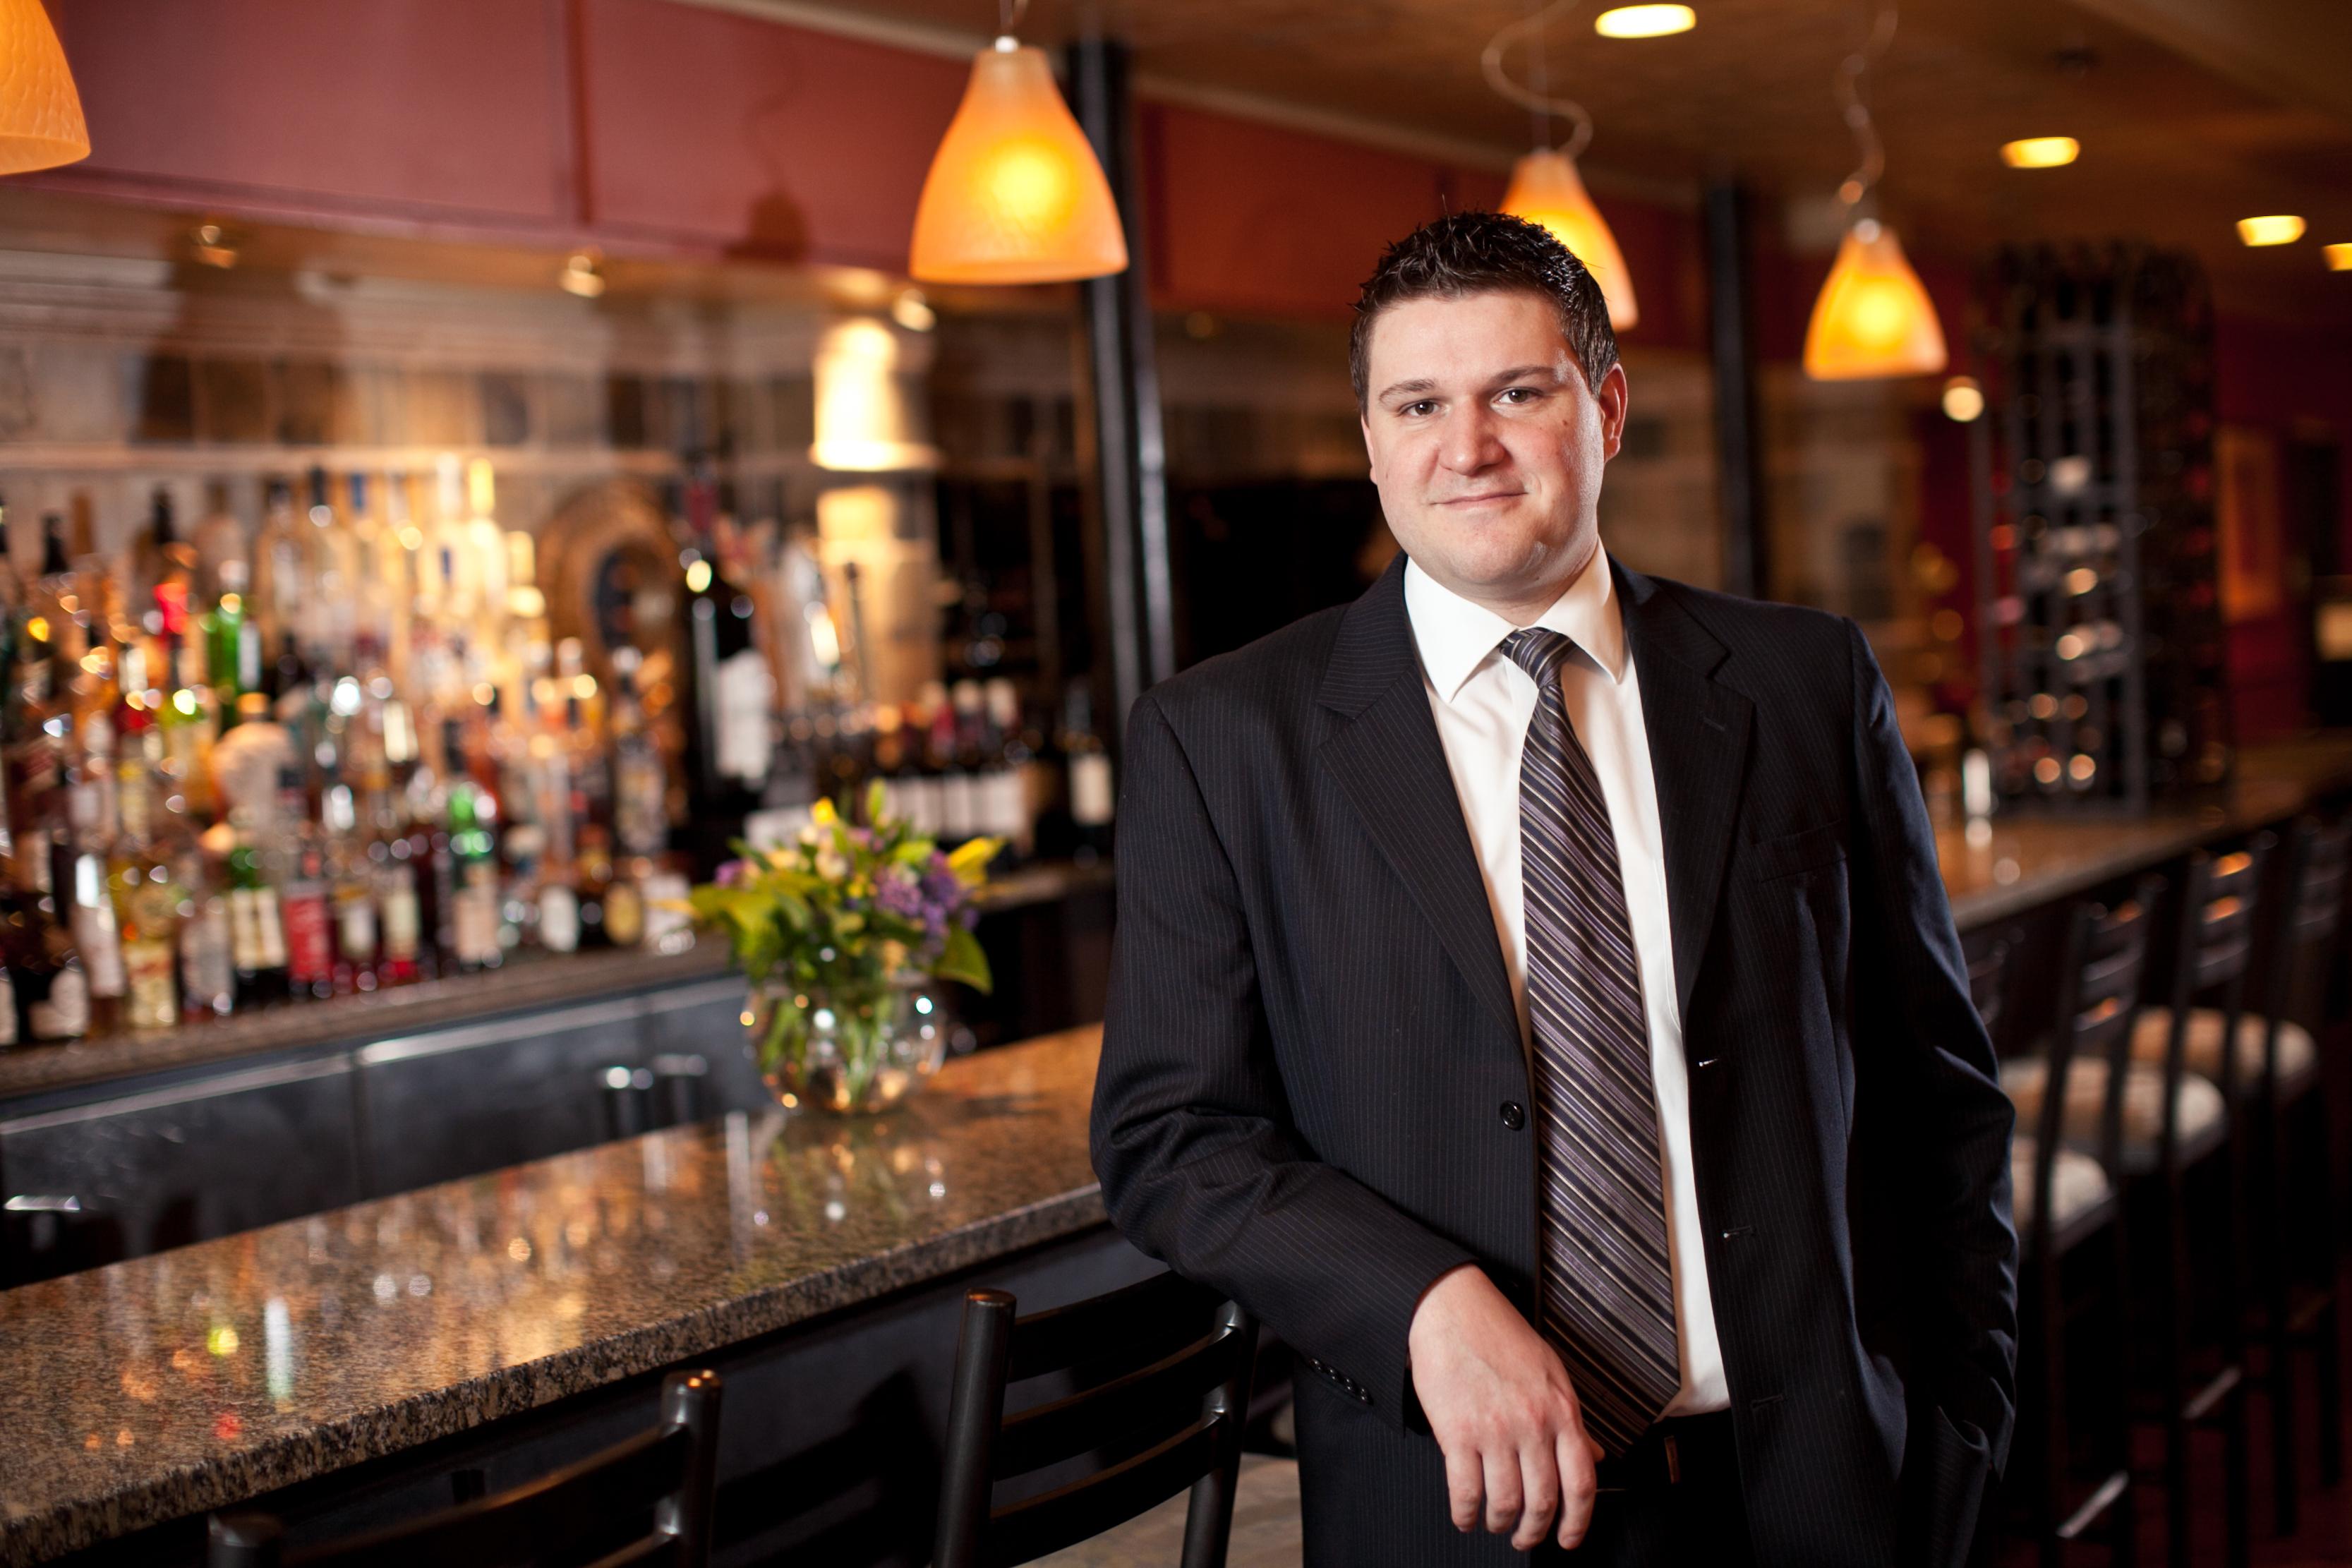 corso bar manager come gestire un locale o un bar